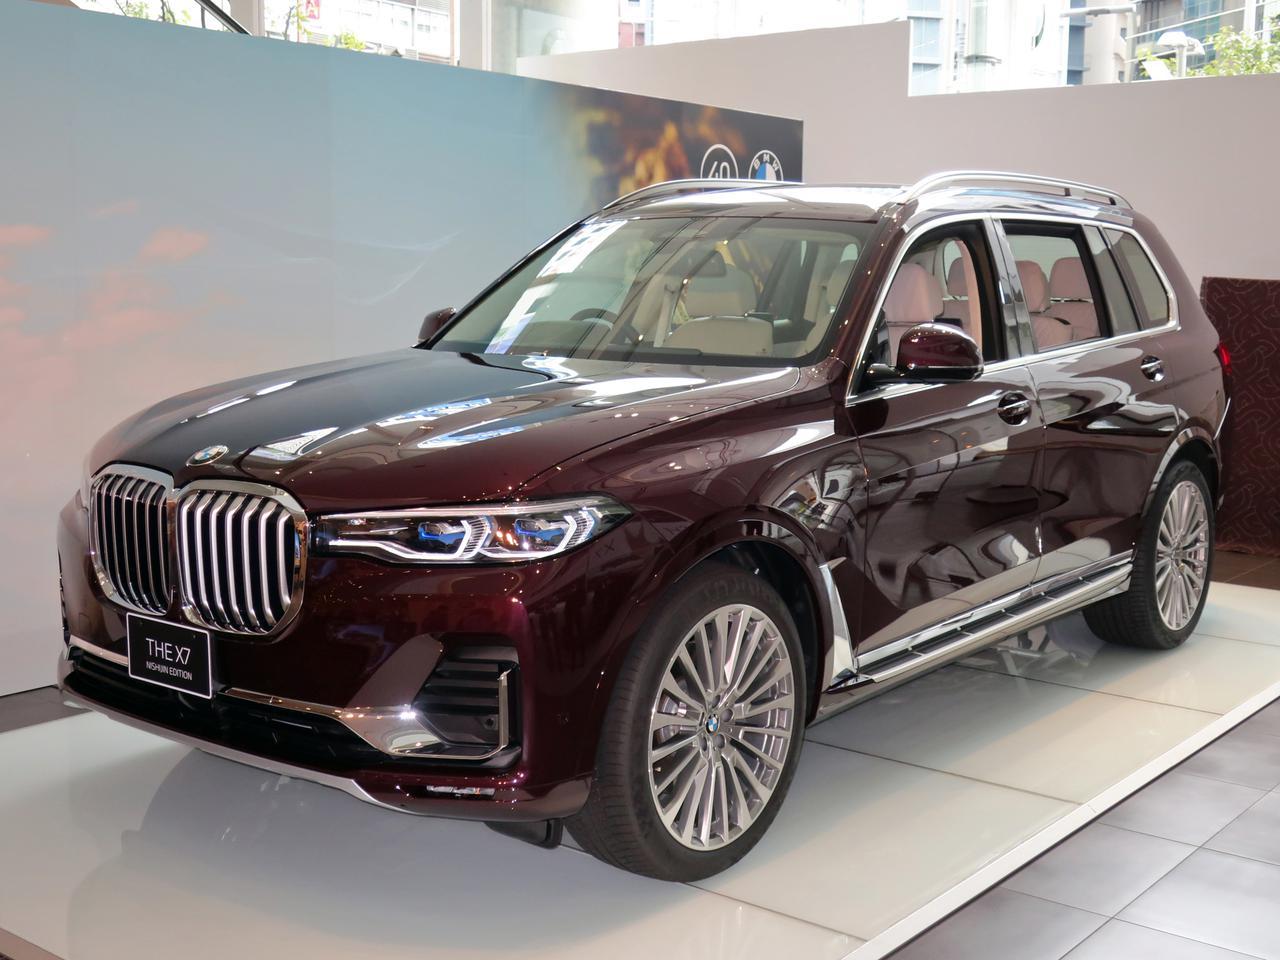 BMWが「X7 西陣エディション」を発表。日本の匠とドイツのクラフトマンシップによる3台の限定車